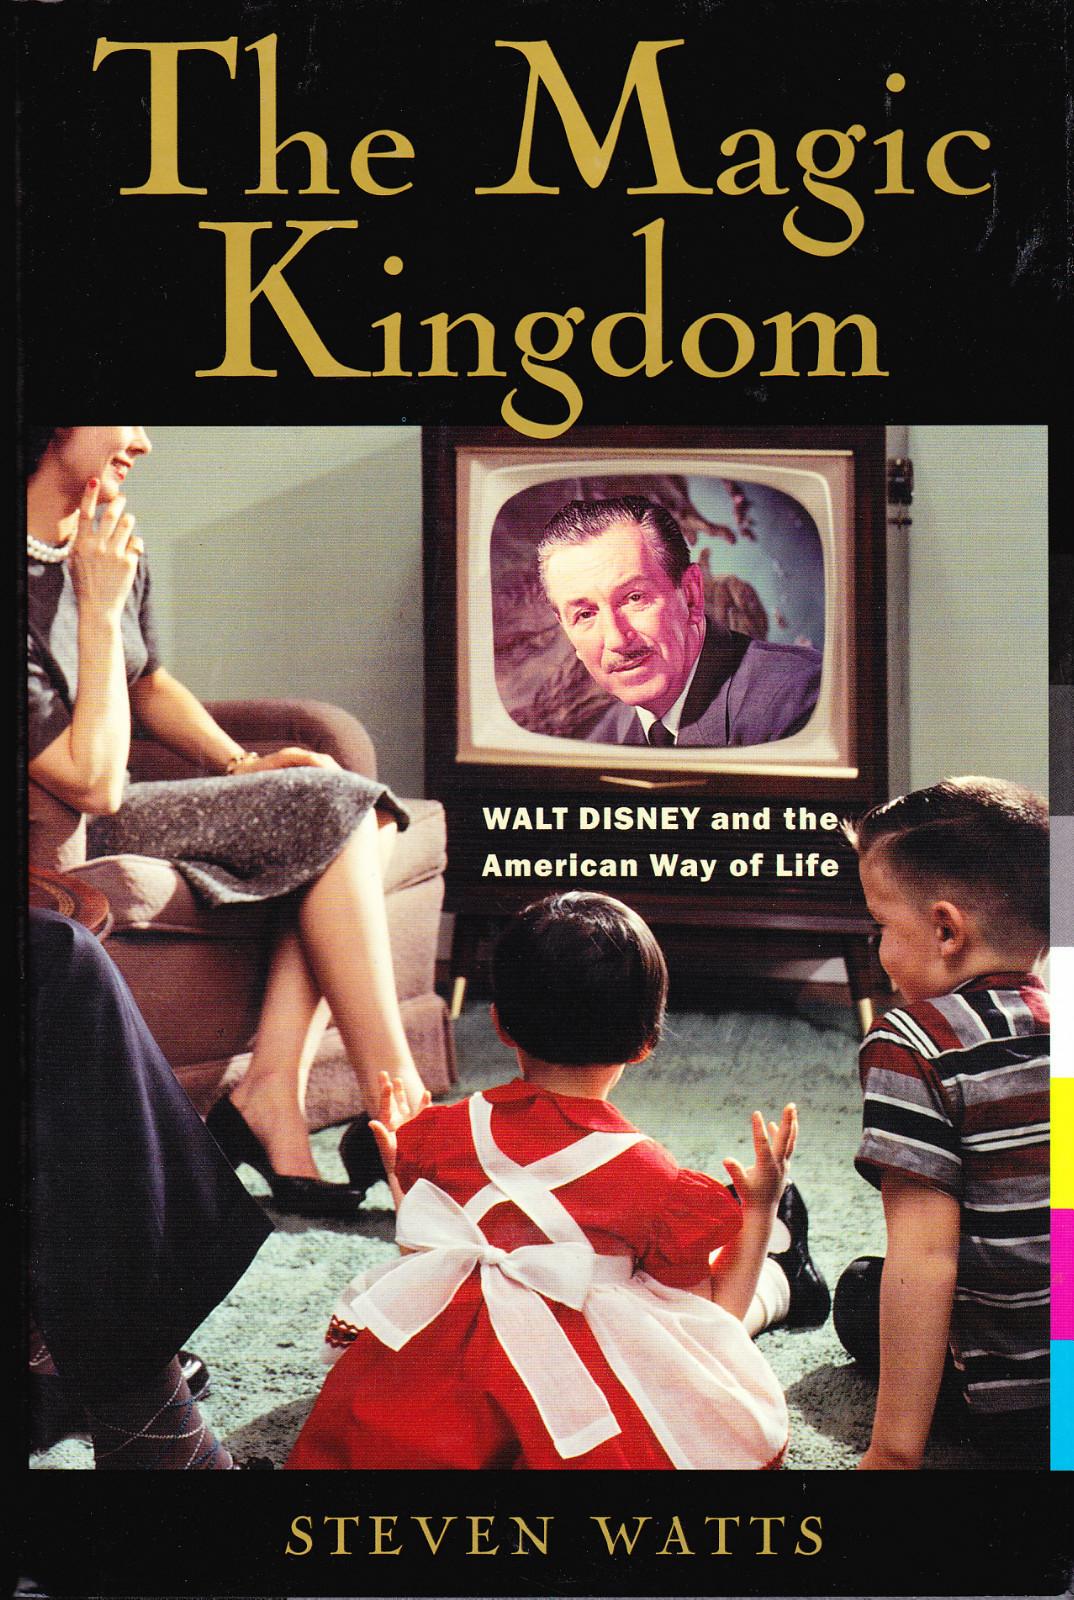 The Magic Kingdom: Walt Disney and the American Way of Life